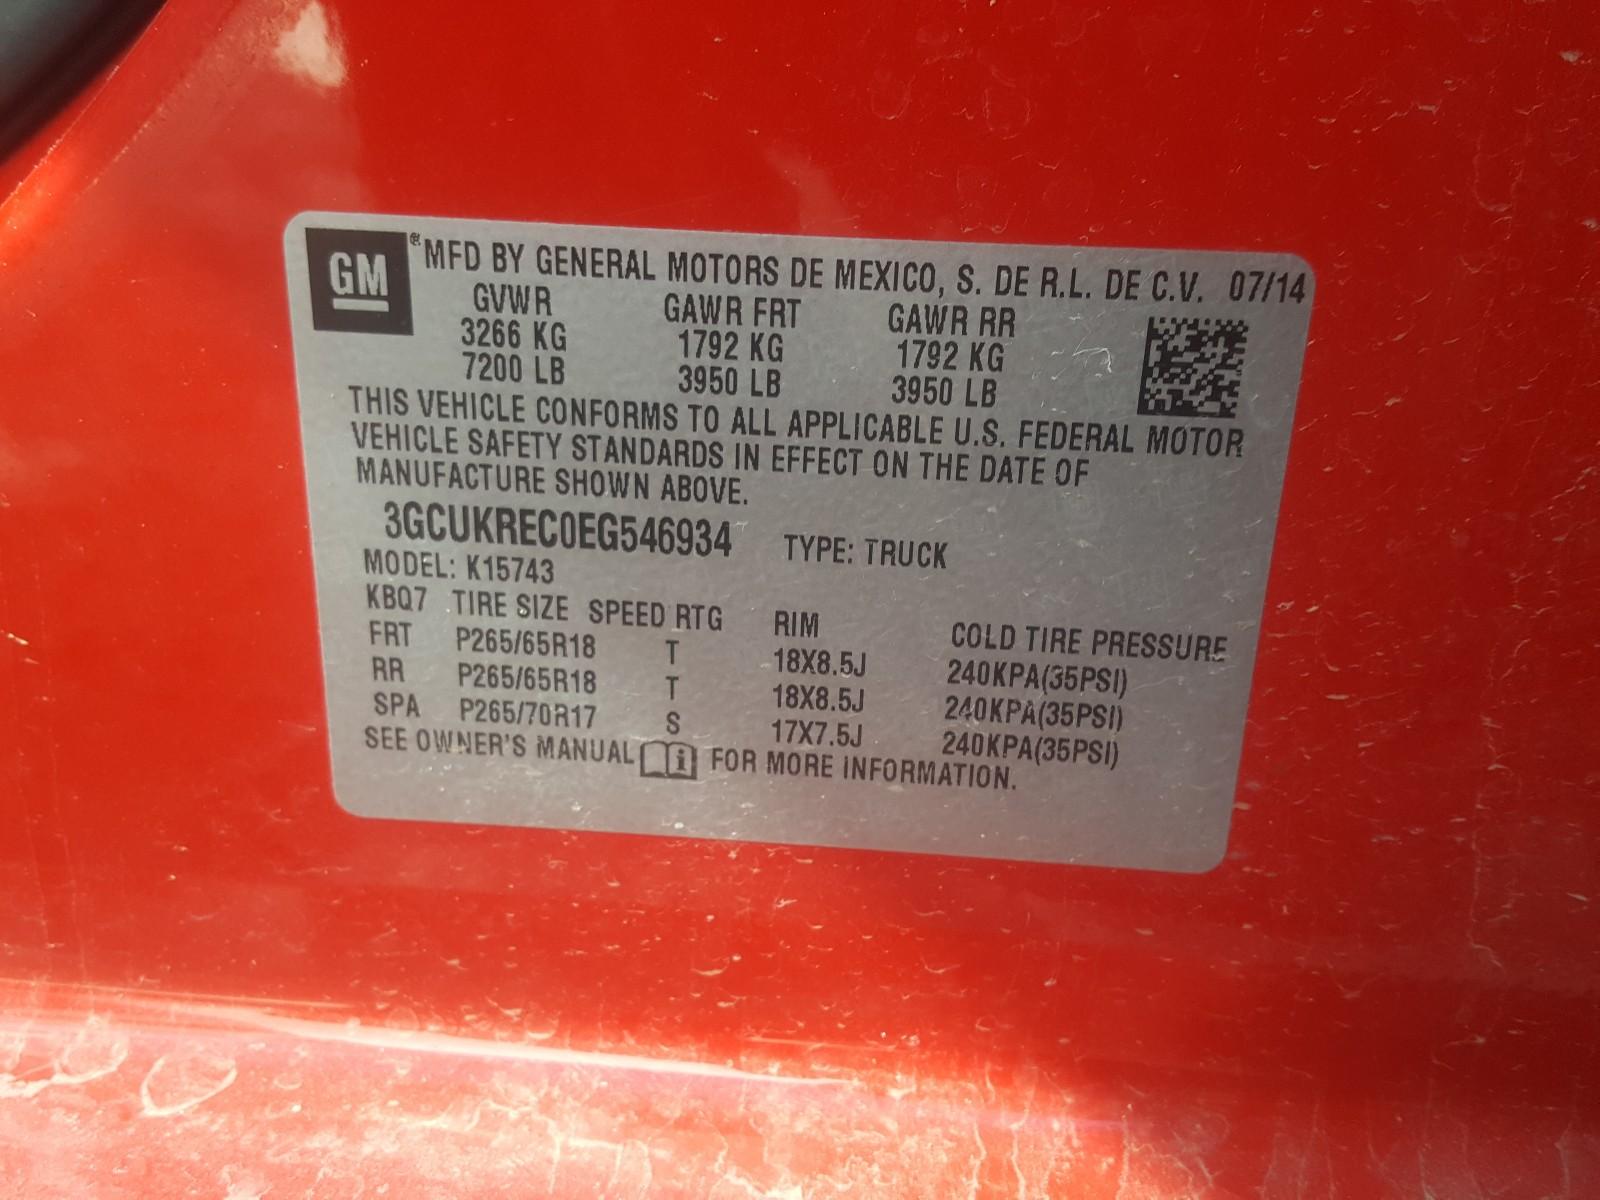 3GCUKREC0EG546934 - 2014 Chevrolet Silverado 5.3L